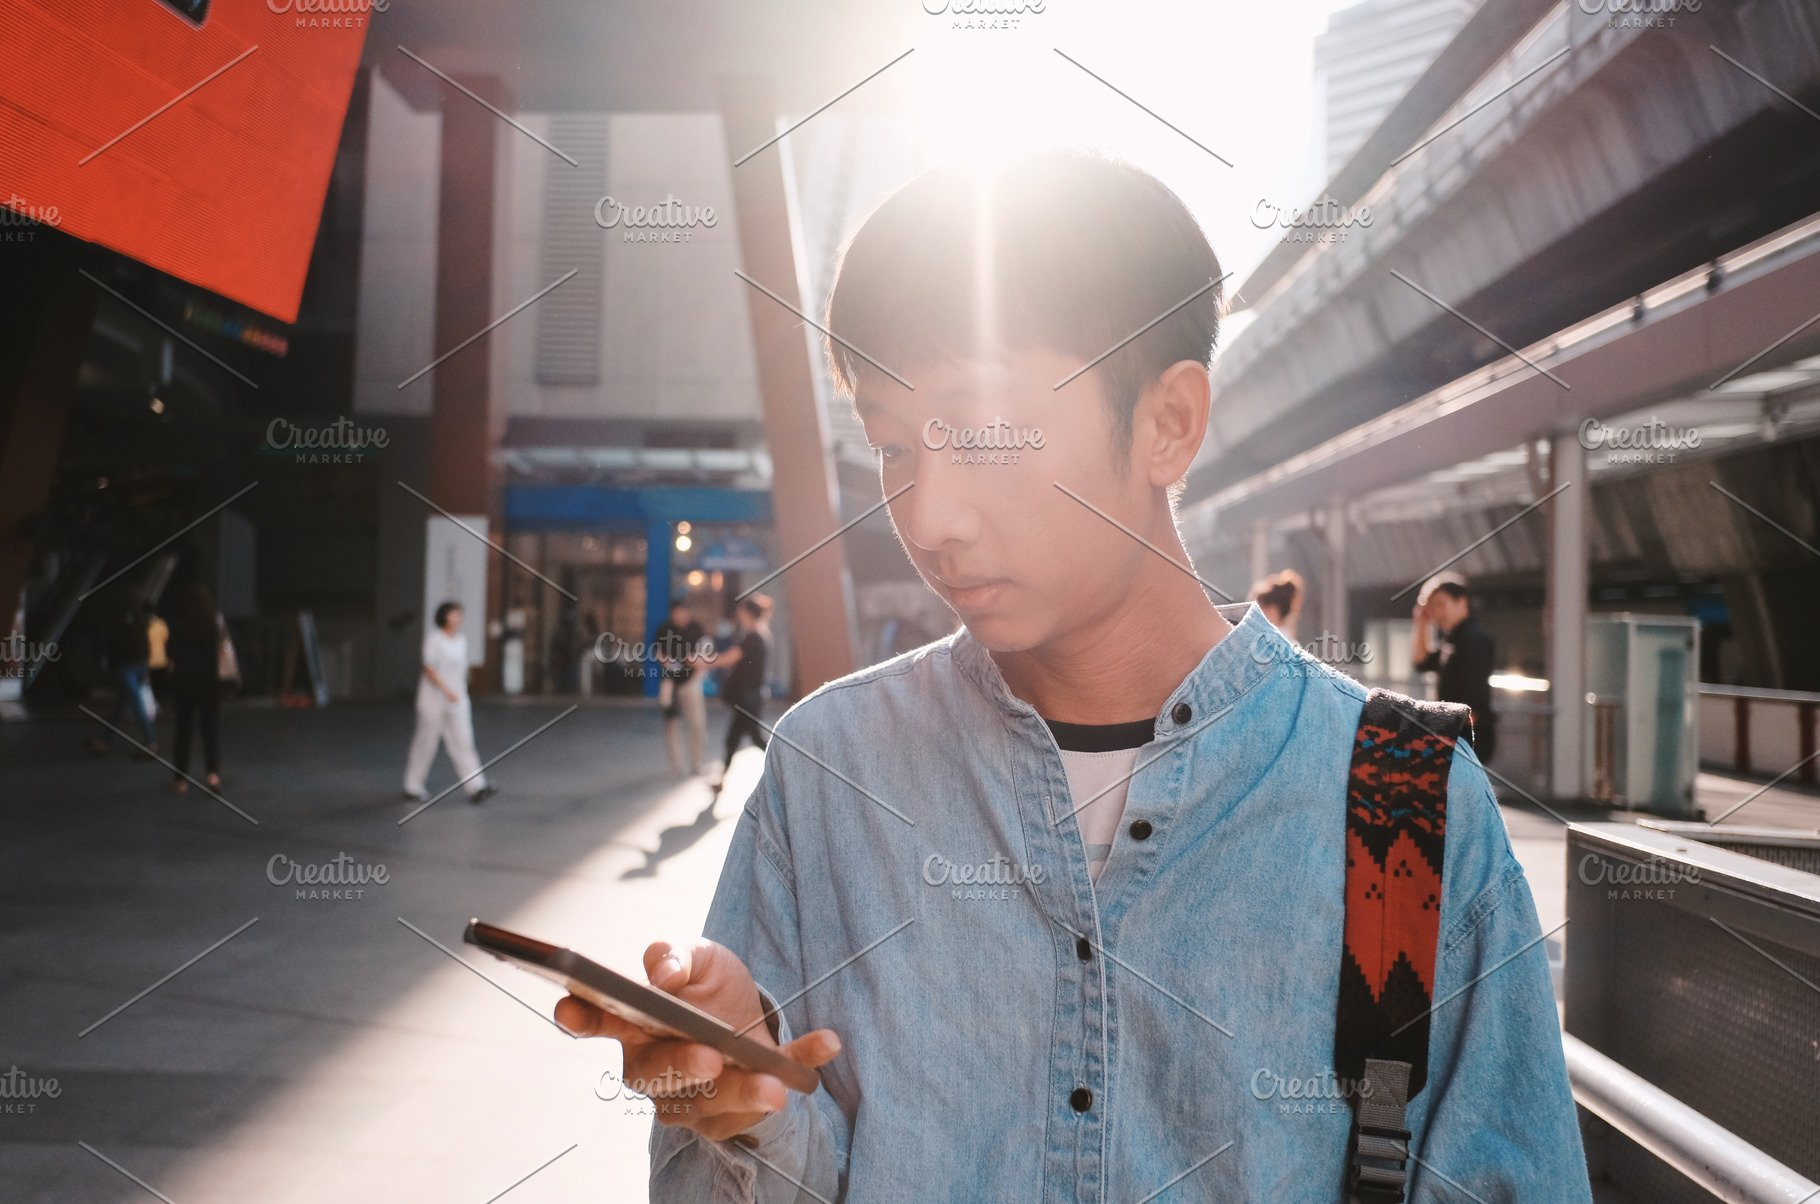 Young asian man using smartphone ~ People Photos ~ Creative Market